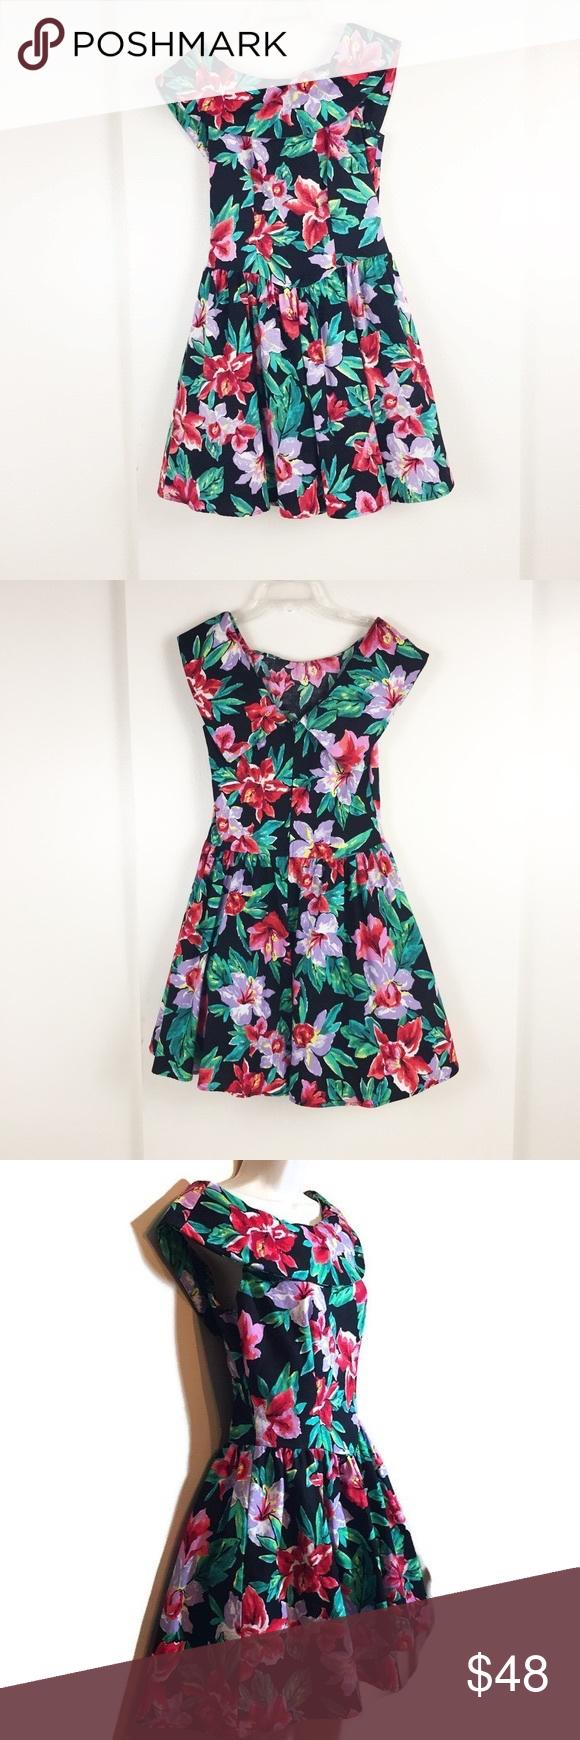 069dba4432b Joni Blair 90s vintage floral dress size 5 Throwback to Kelly kapowski  anyone  This is